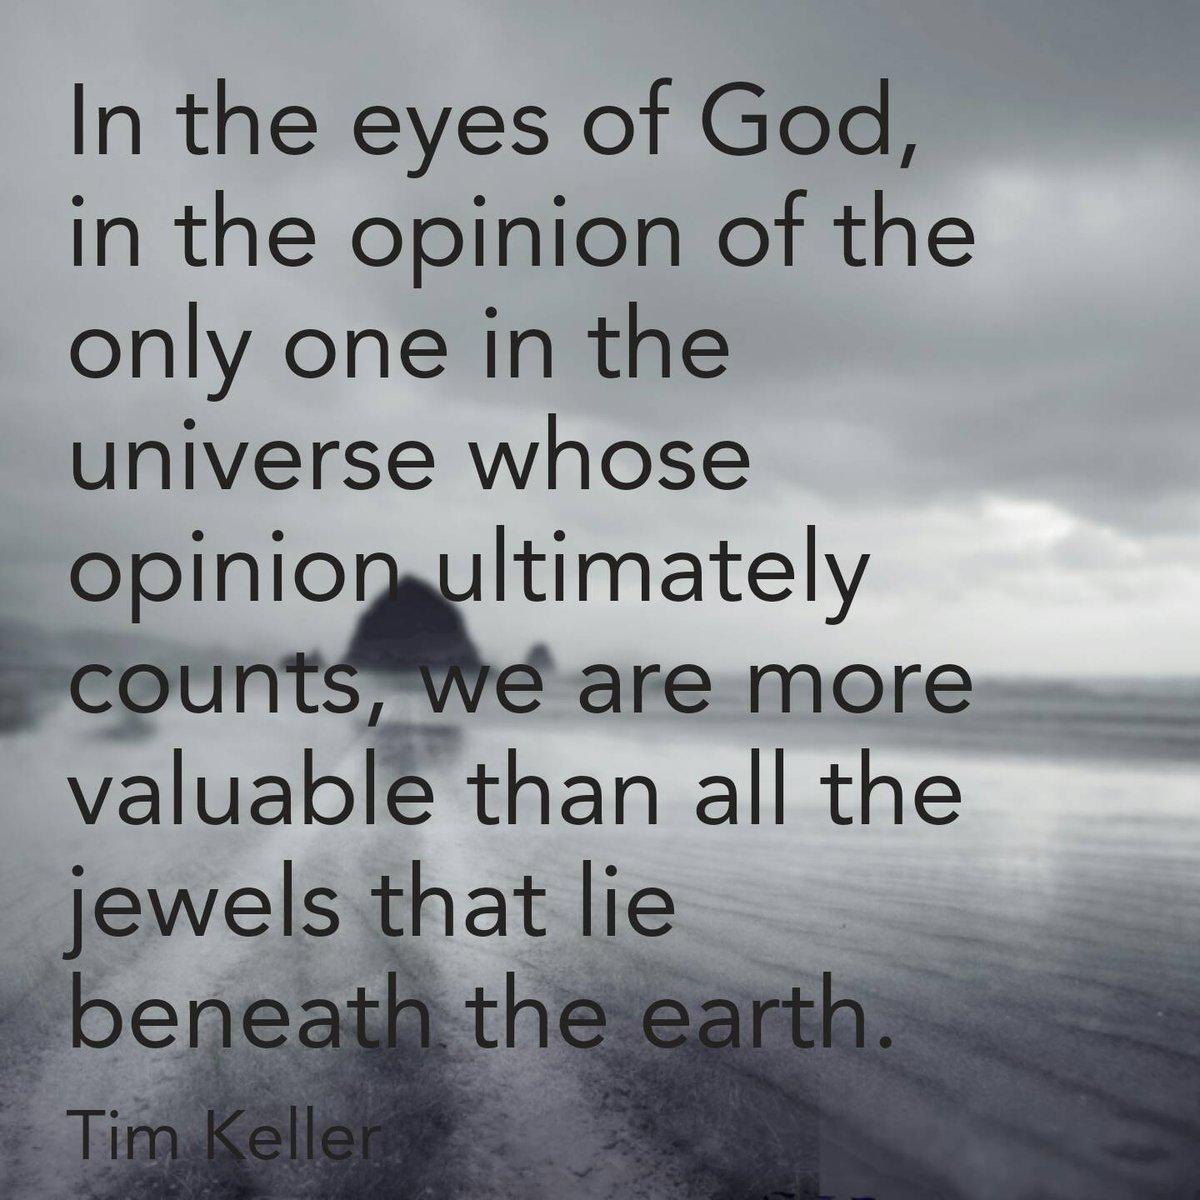 Tim Keller Quotes | Tim Keller Wisdom On Twitter